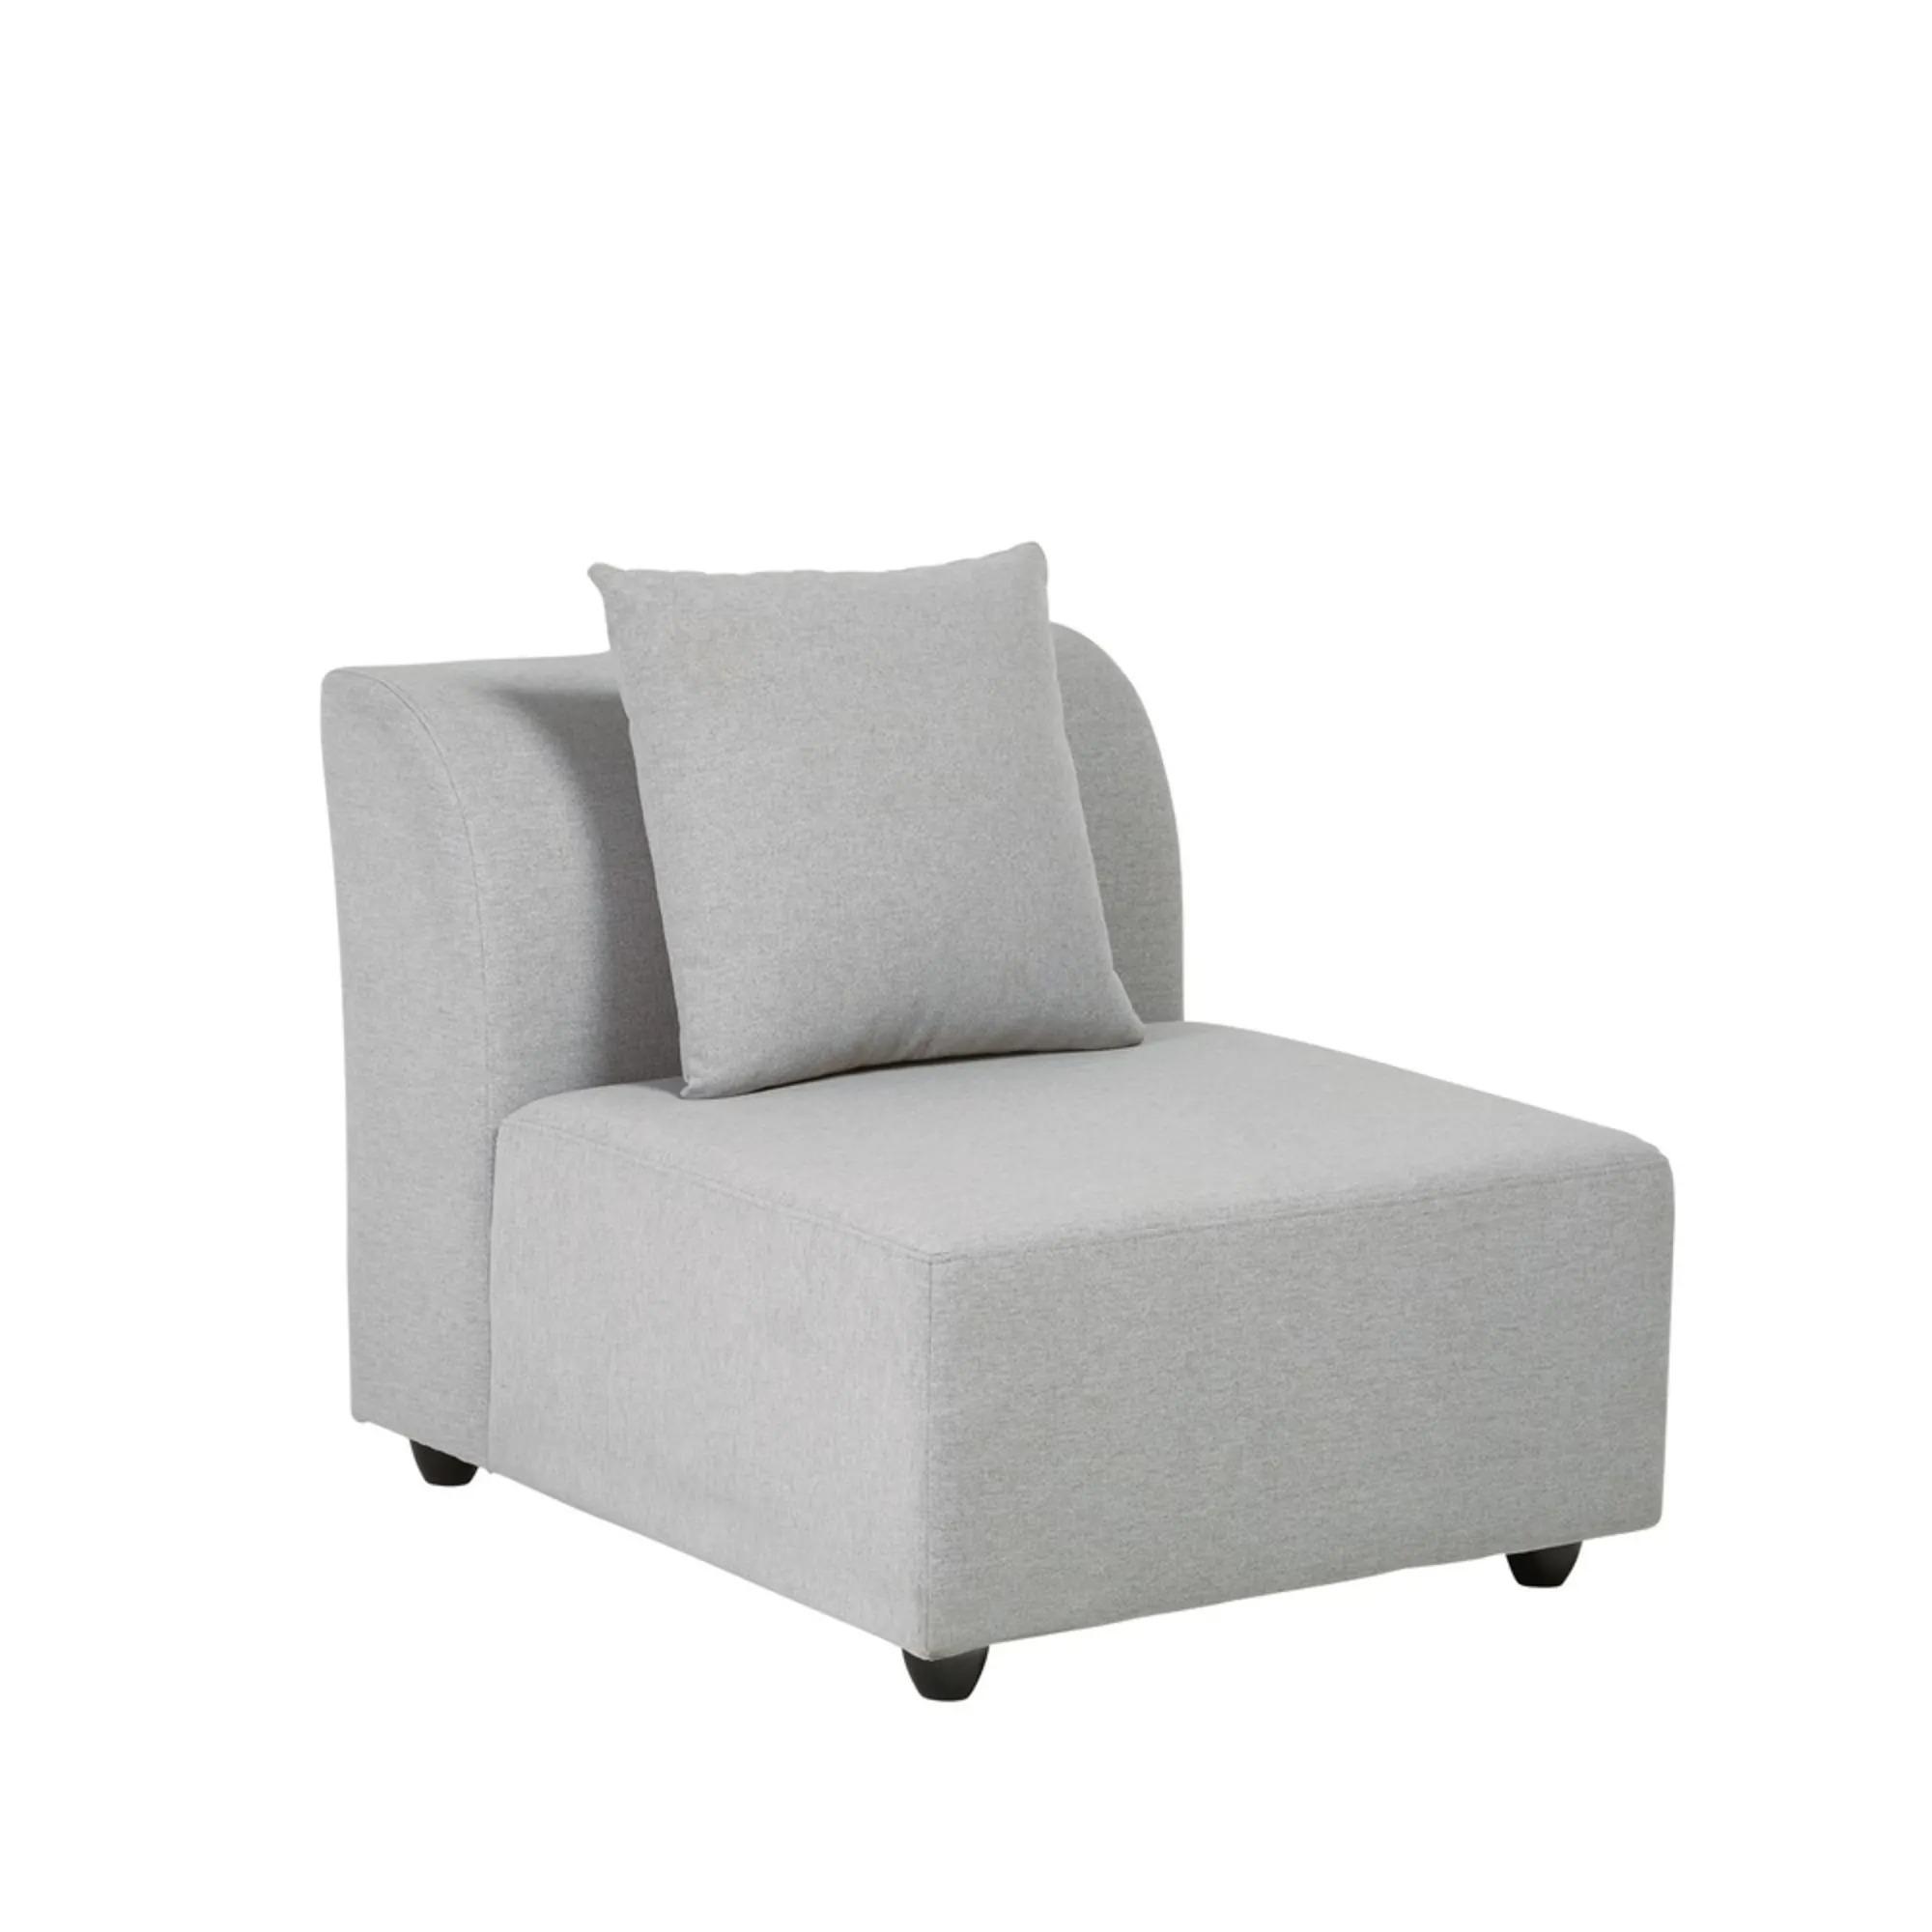 LUCY- Butaca de sofá modular gris claro